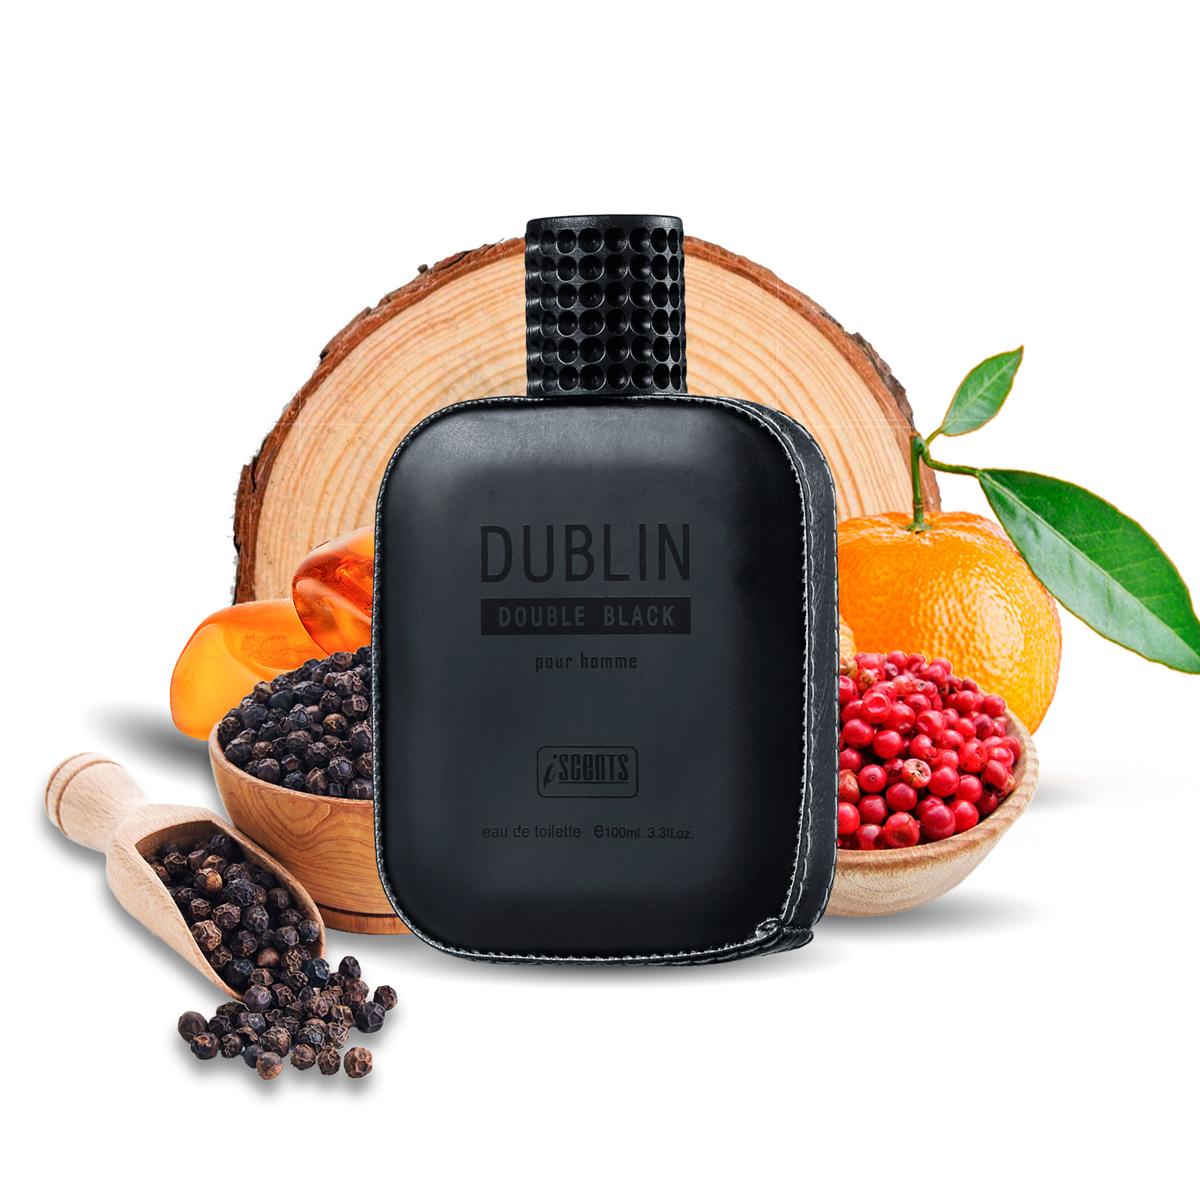 Kit 2 Perfumes Importados Silver Spirit e Dublin I Scents